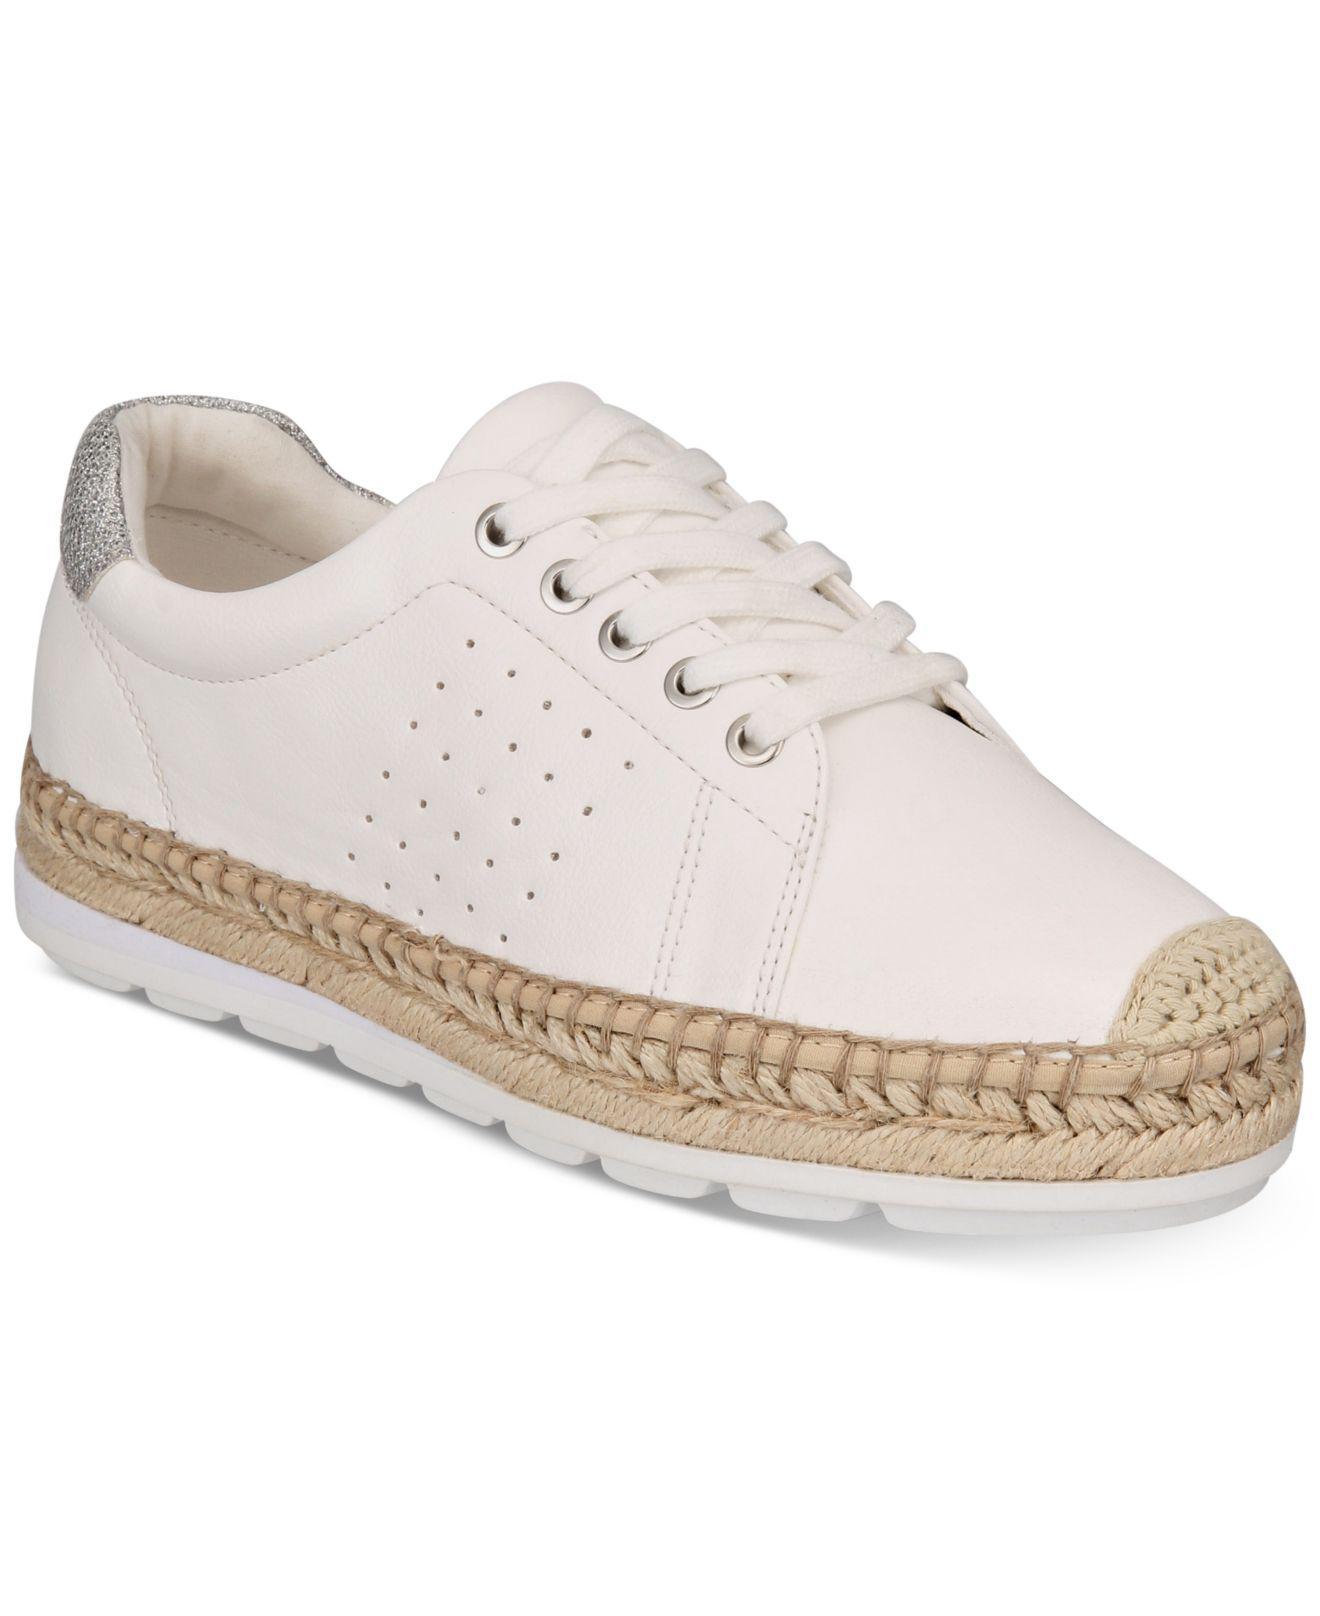 105dc794c6f ALDO Methuen Espadrille Sneakers ZnS7ibdQ0 - downrivercapital.com